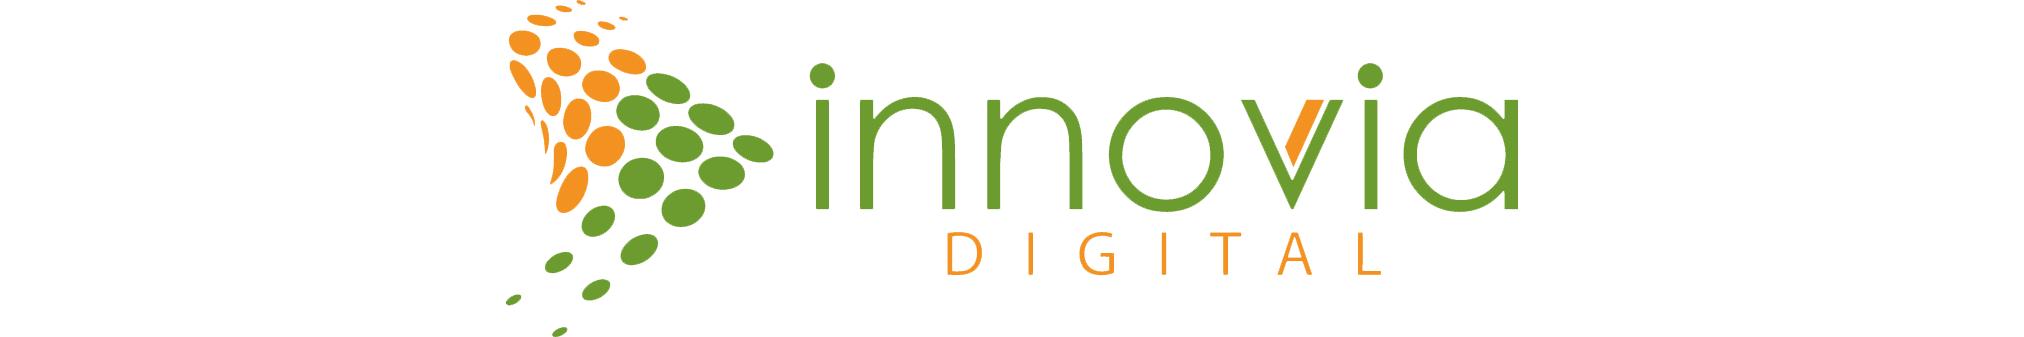 Innovia Digital kapak logo